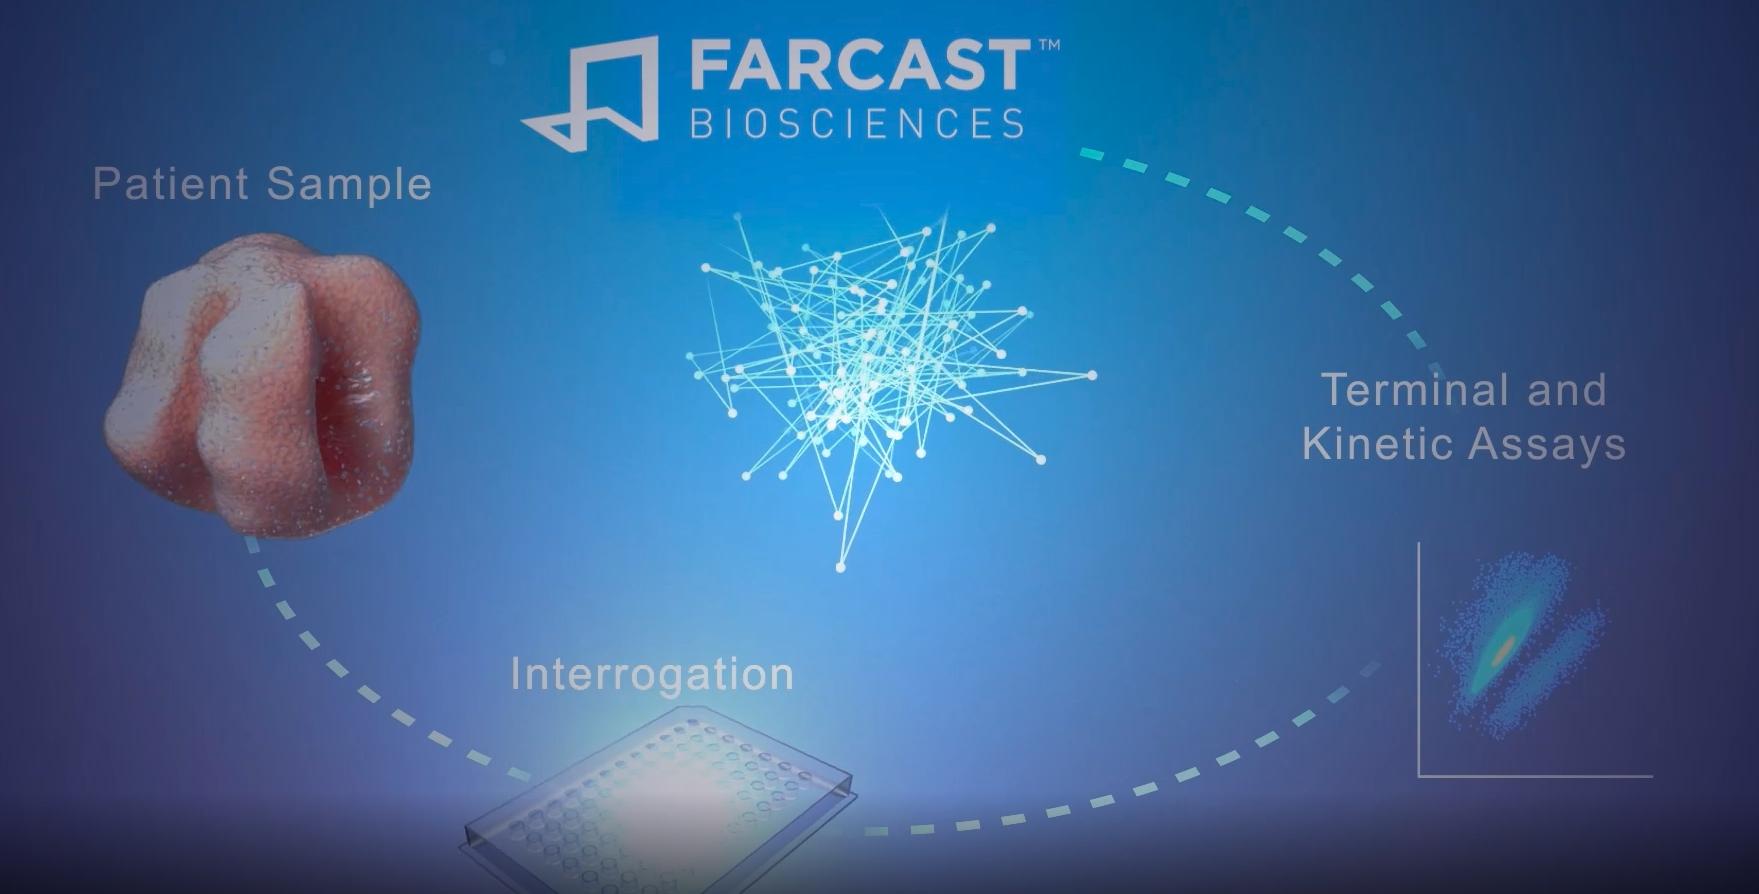 Farcast Biosciences